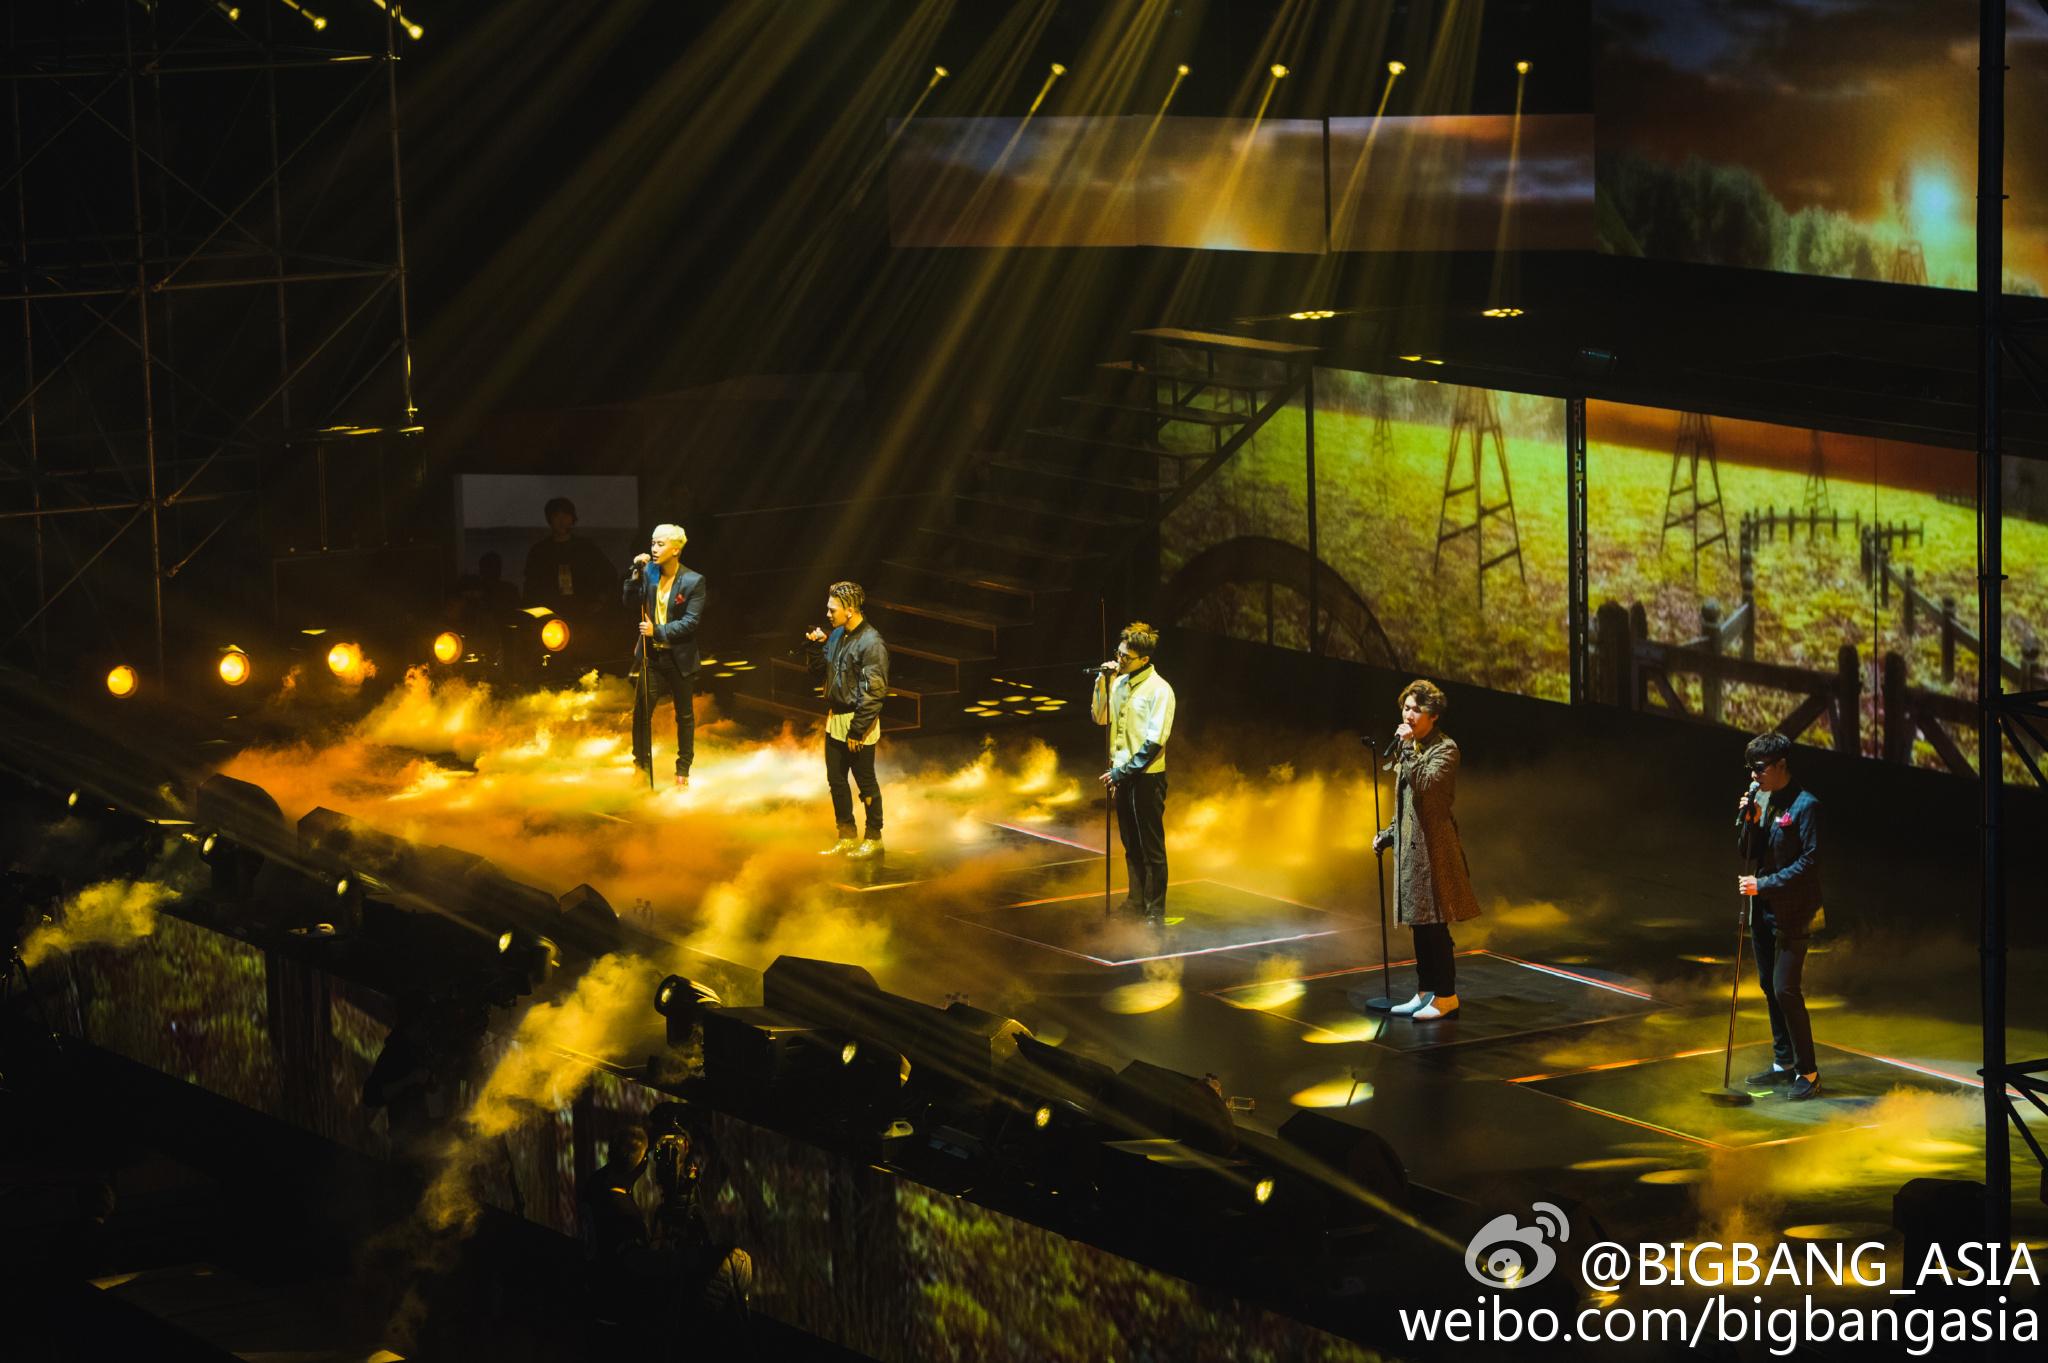 Big Bang - Made V.I.P Tour - Nanjing - 19mar2016 - BIGBANG_ASIA - 04.jpg